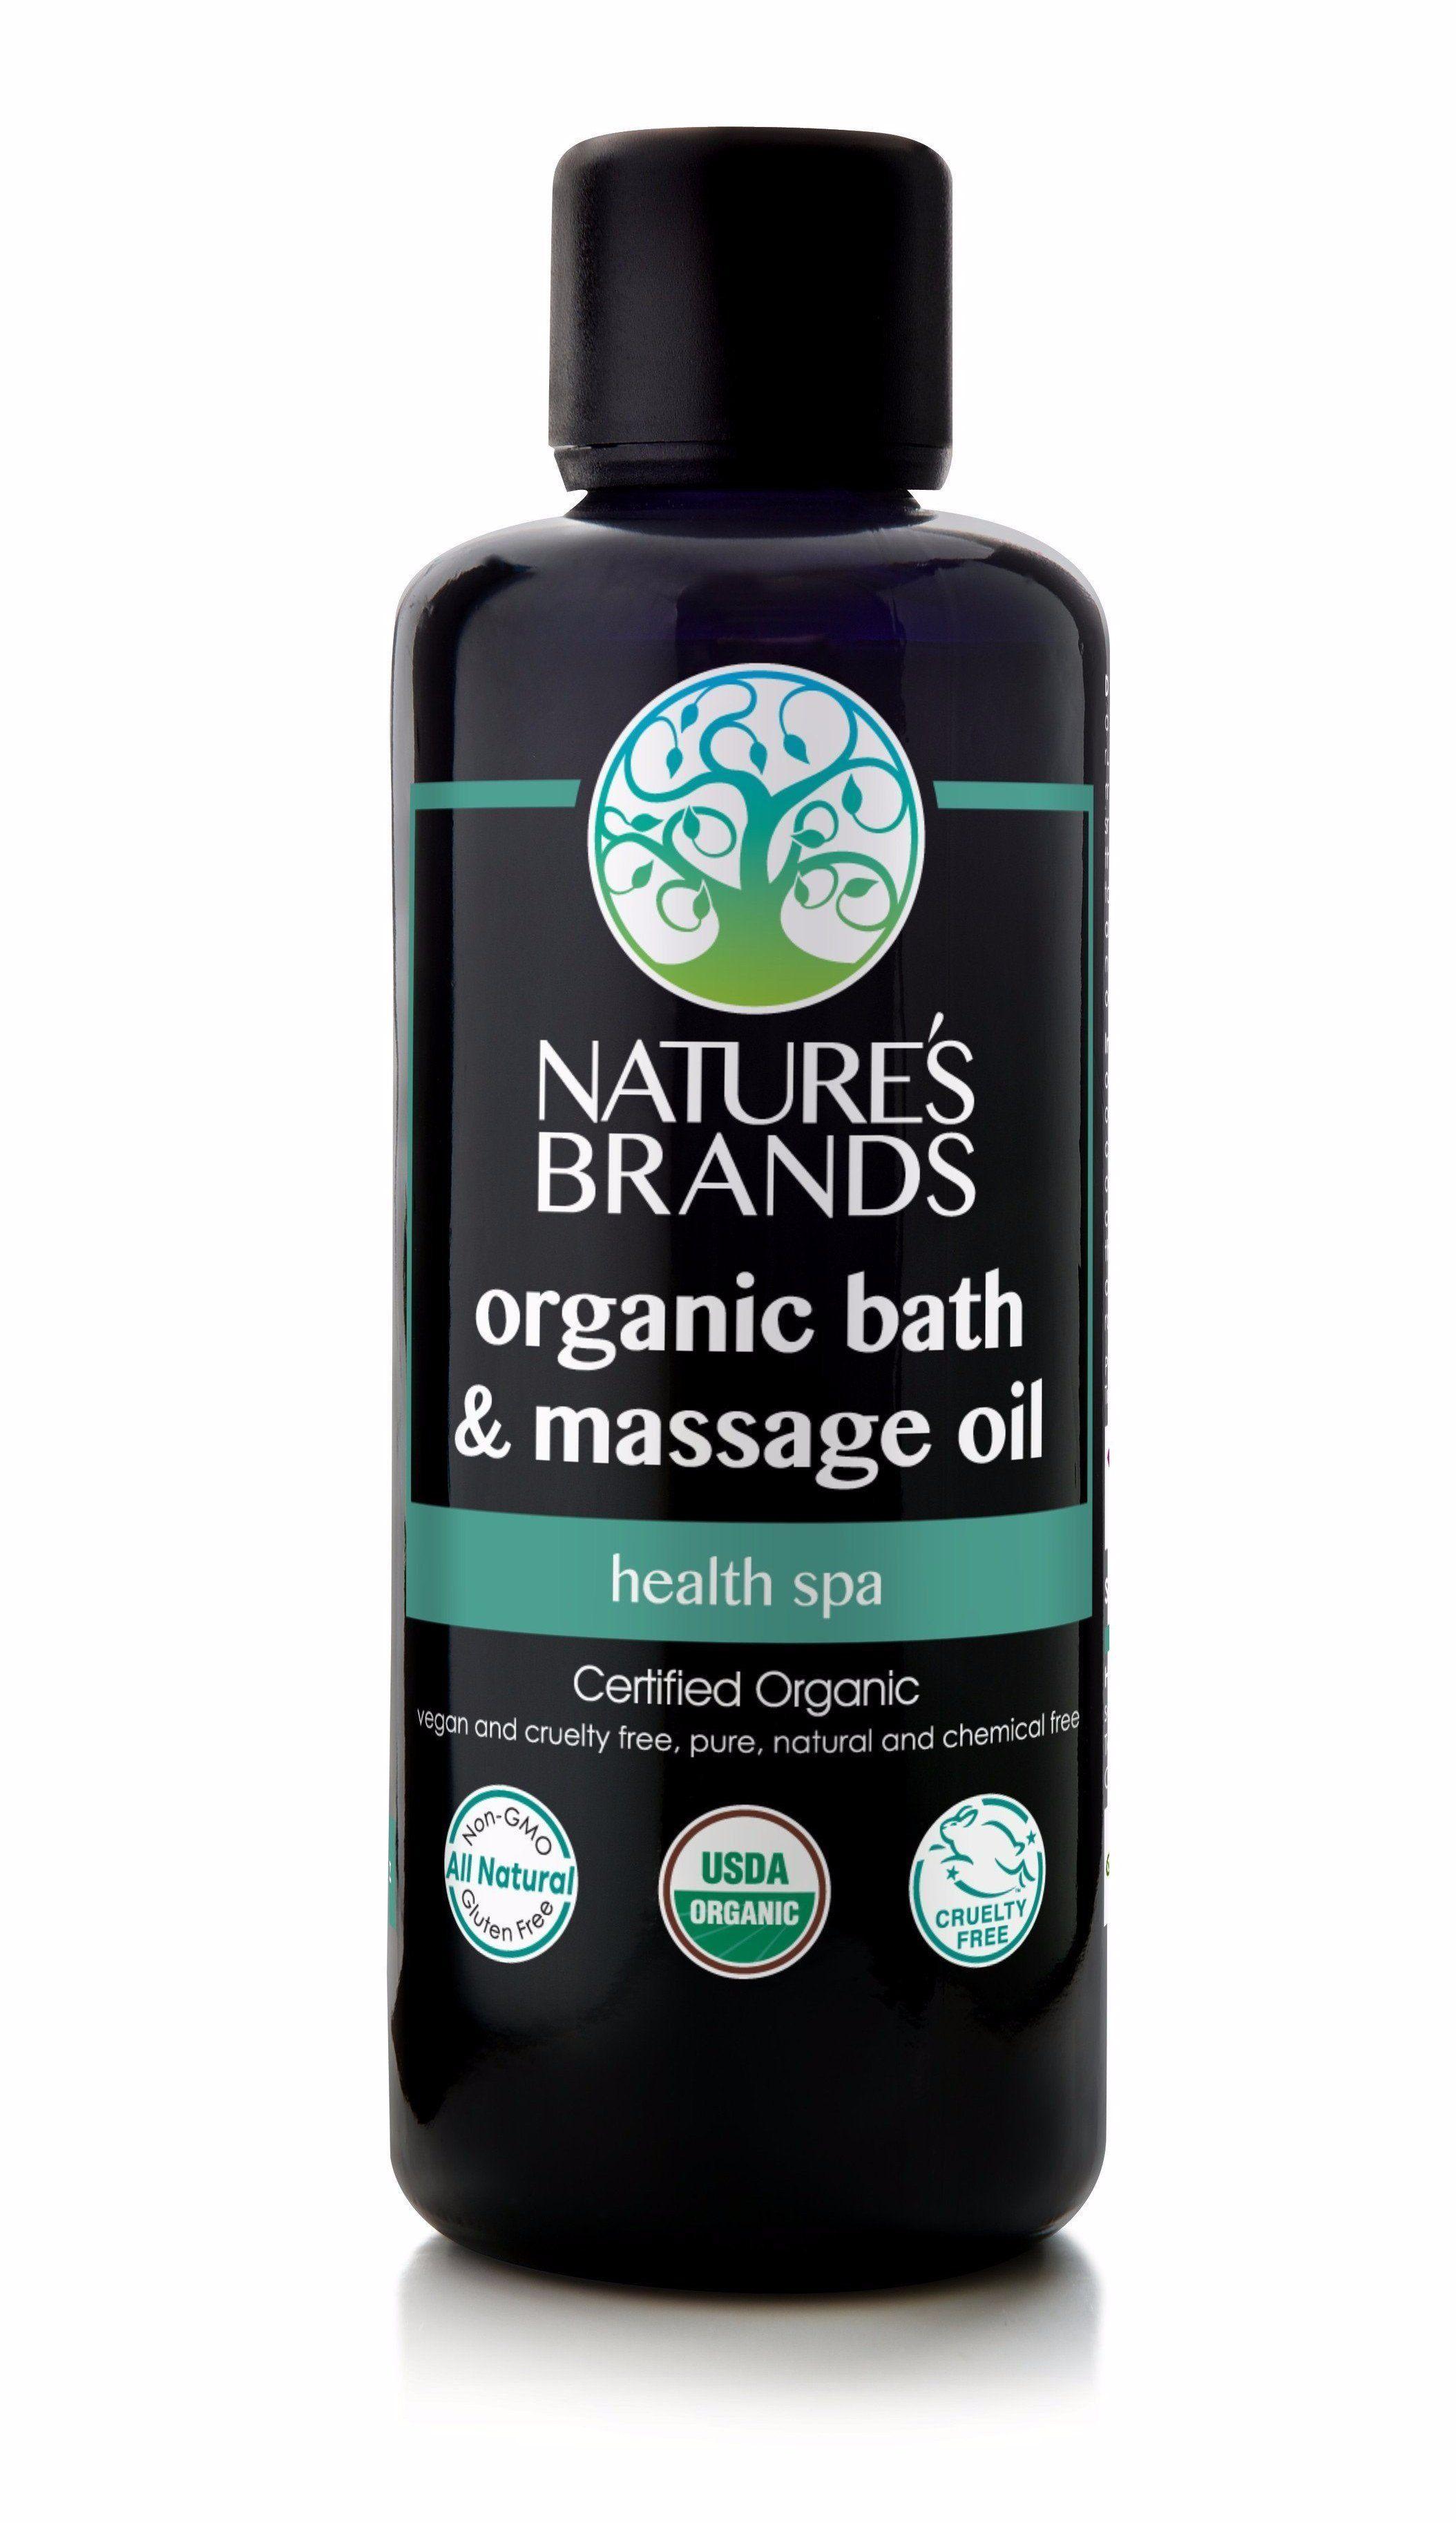 Herbal Choice Mari Organic Bath & Massage Oil, Health Spa for Your ...